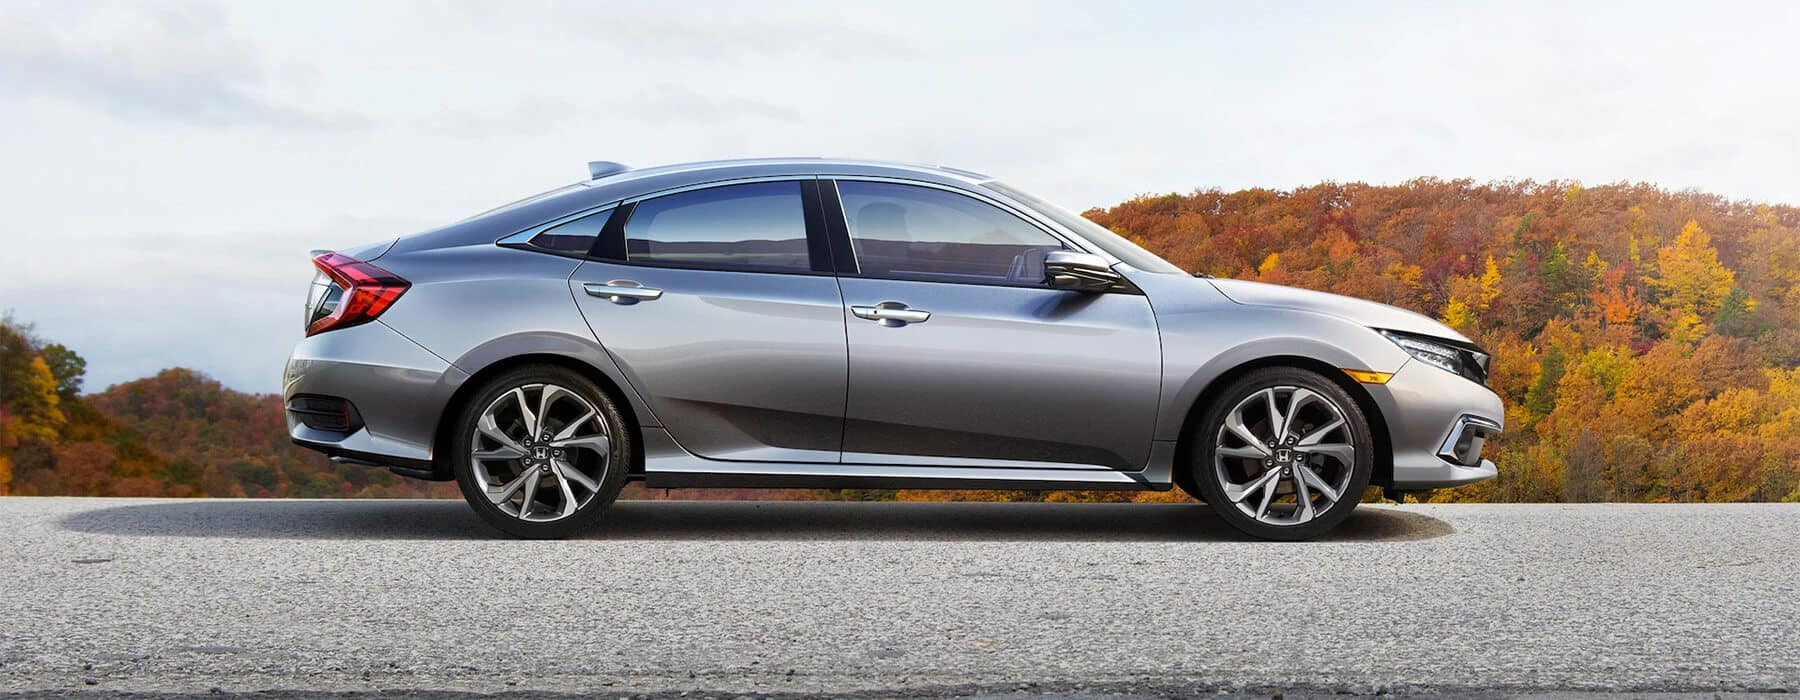 Vern Eide Honda Zero Percent Financing Offers Slider